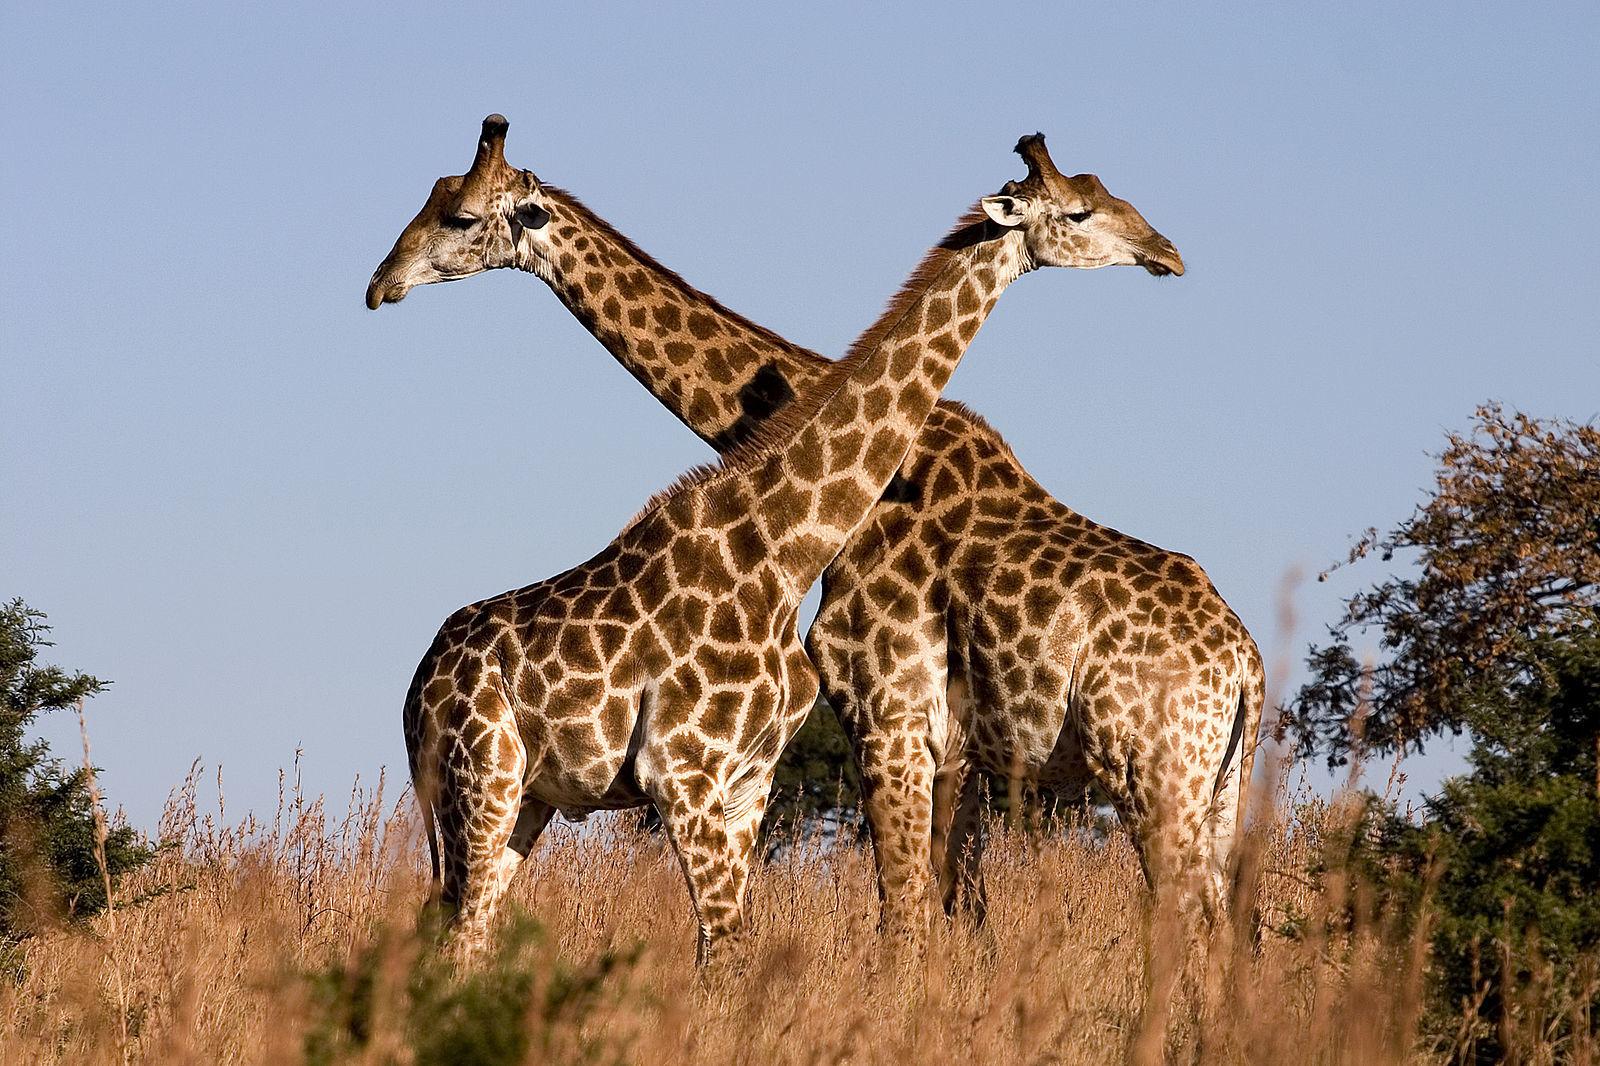 Wildwatch Kenya